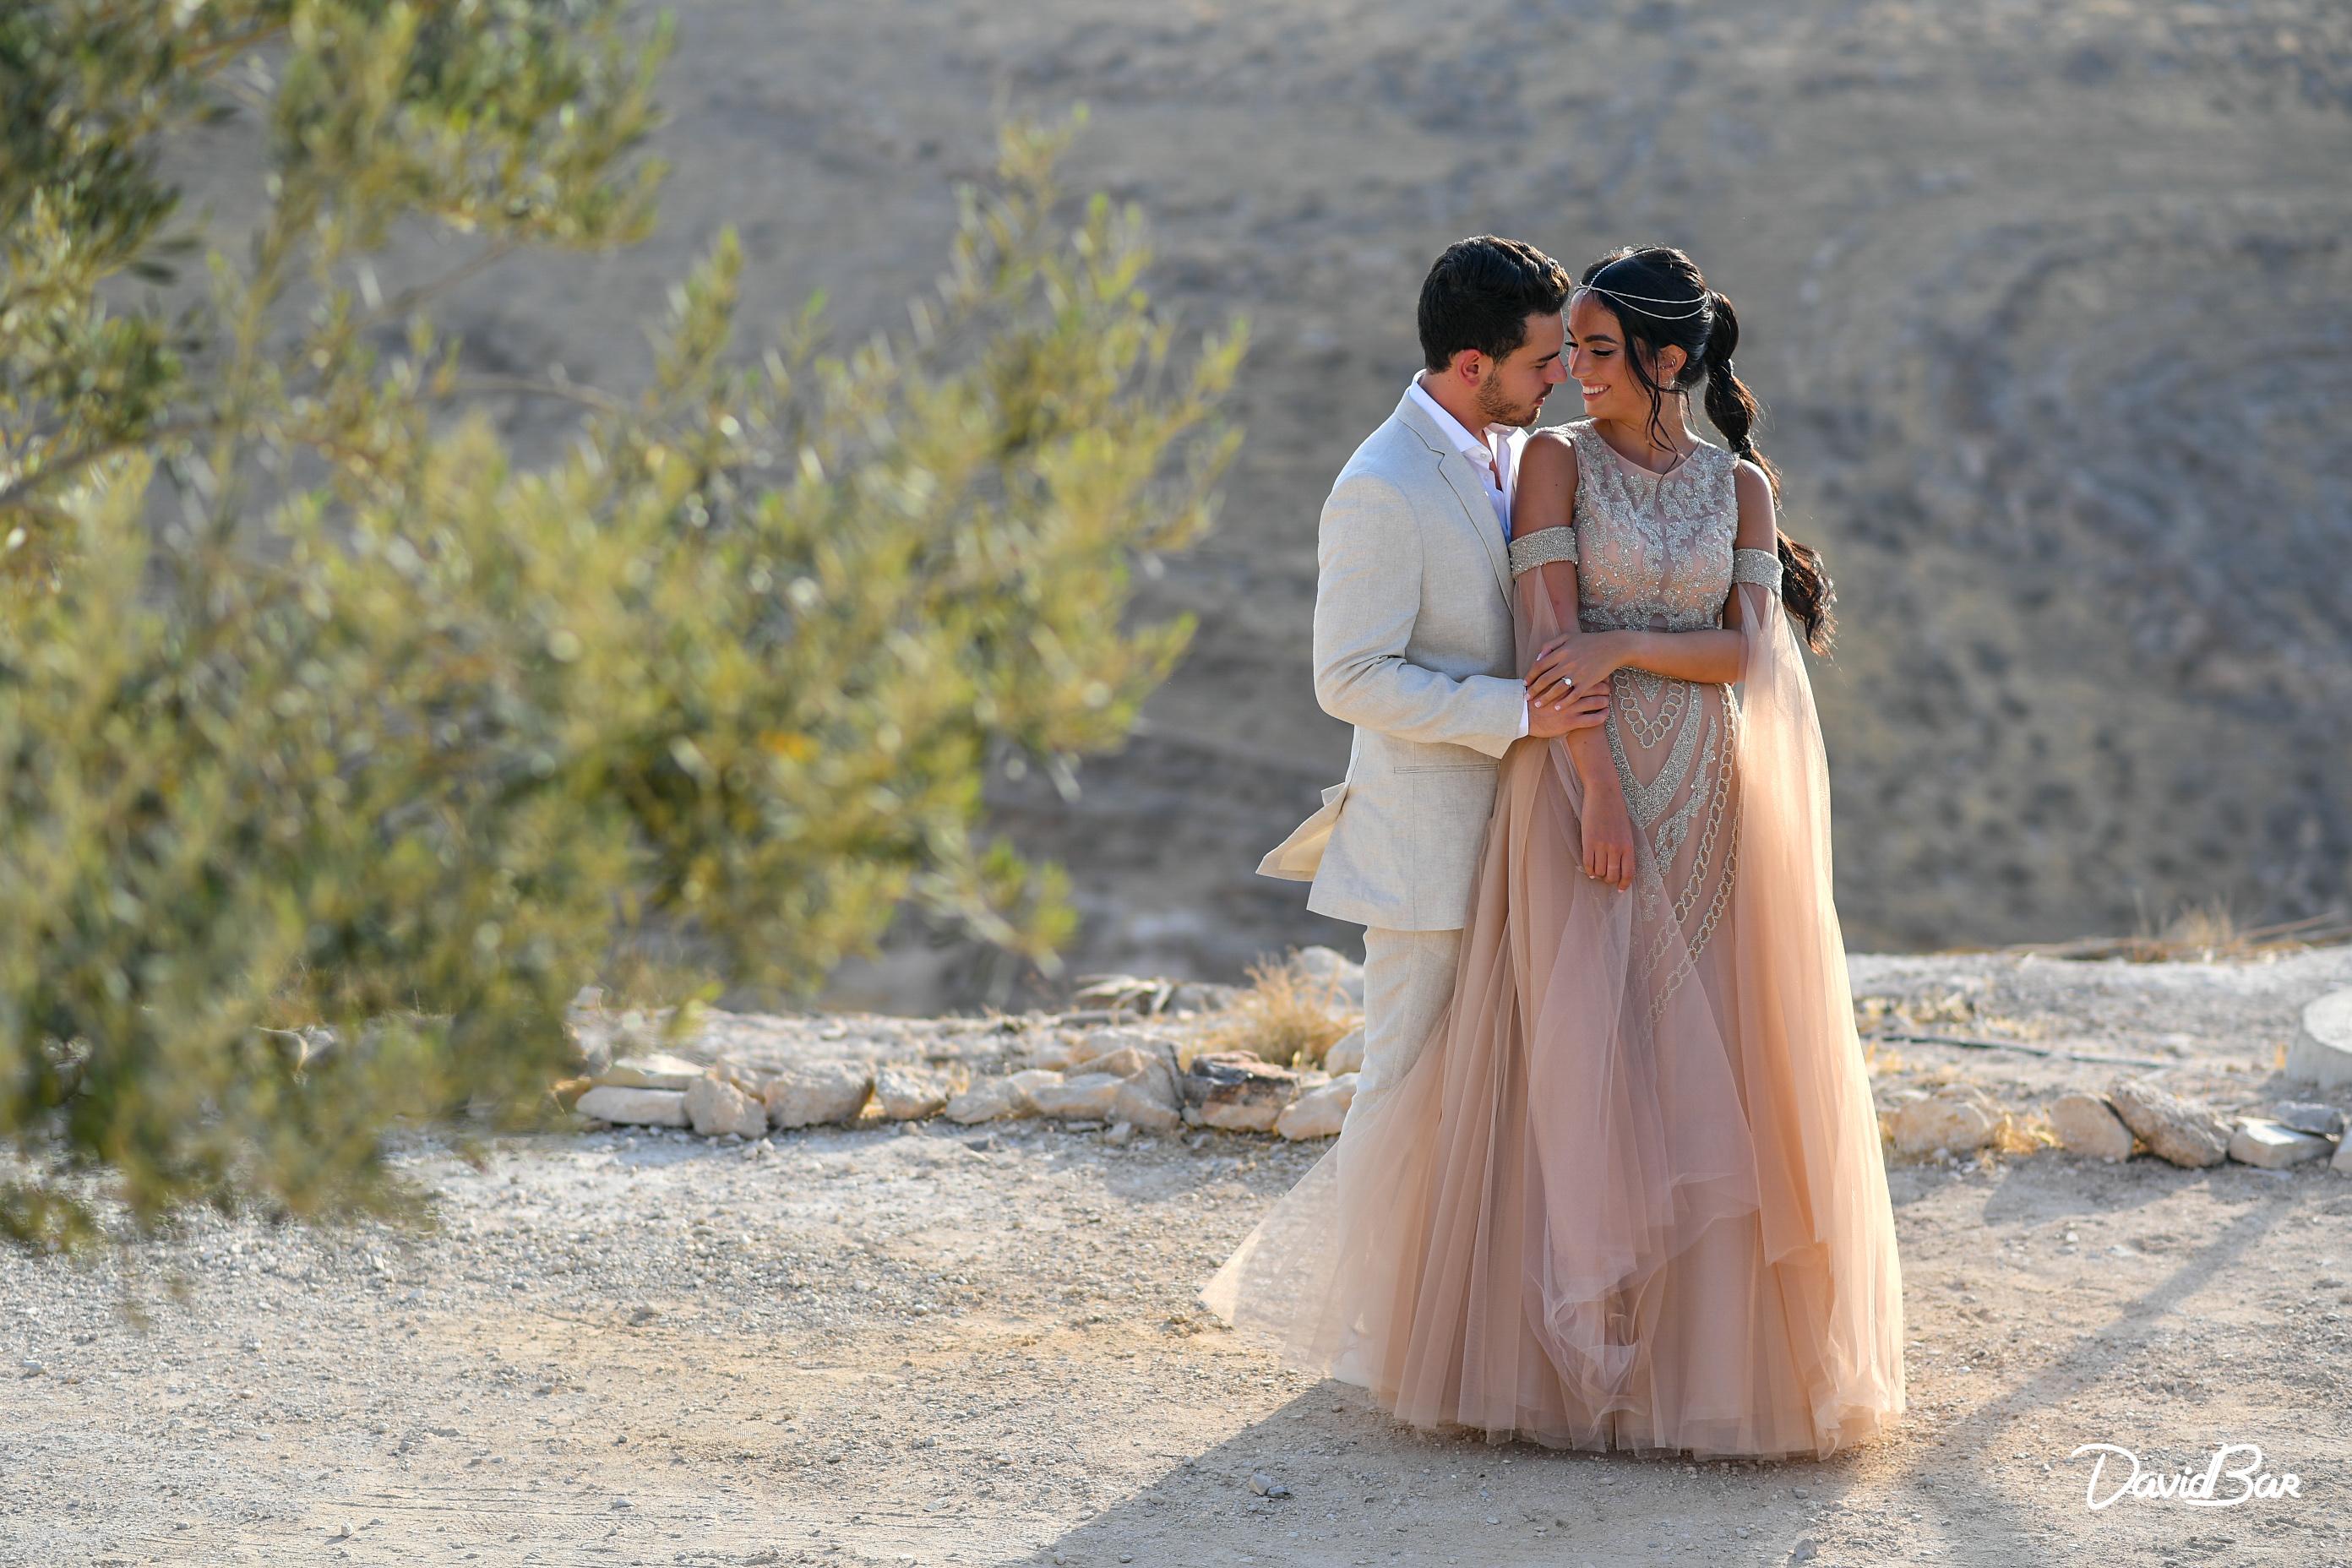 Wedding on the edge of a cliff. Photos by David Bar